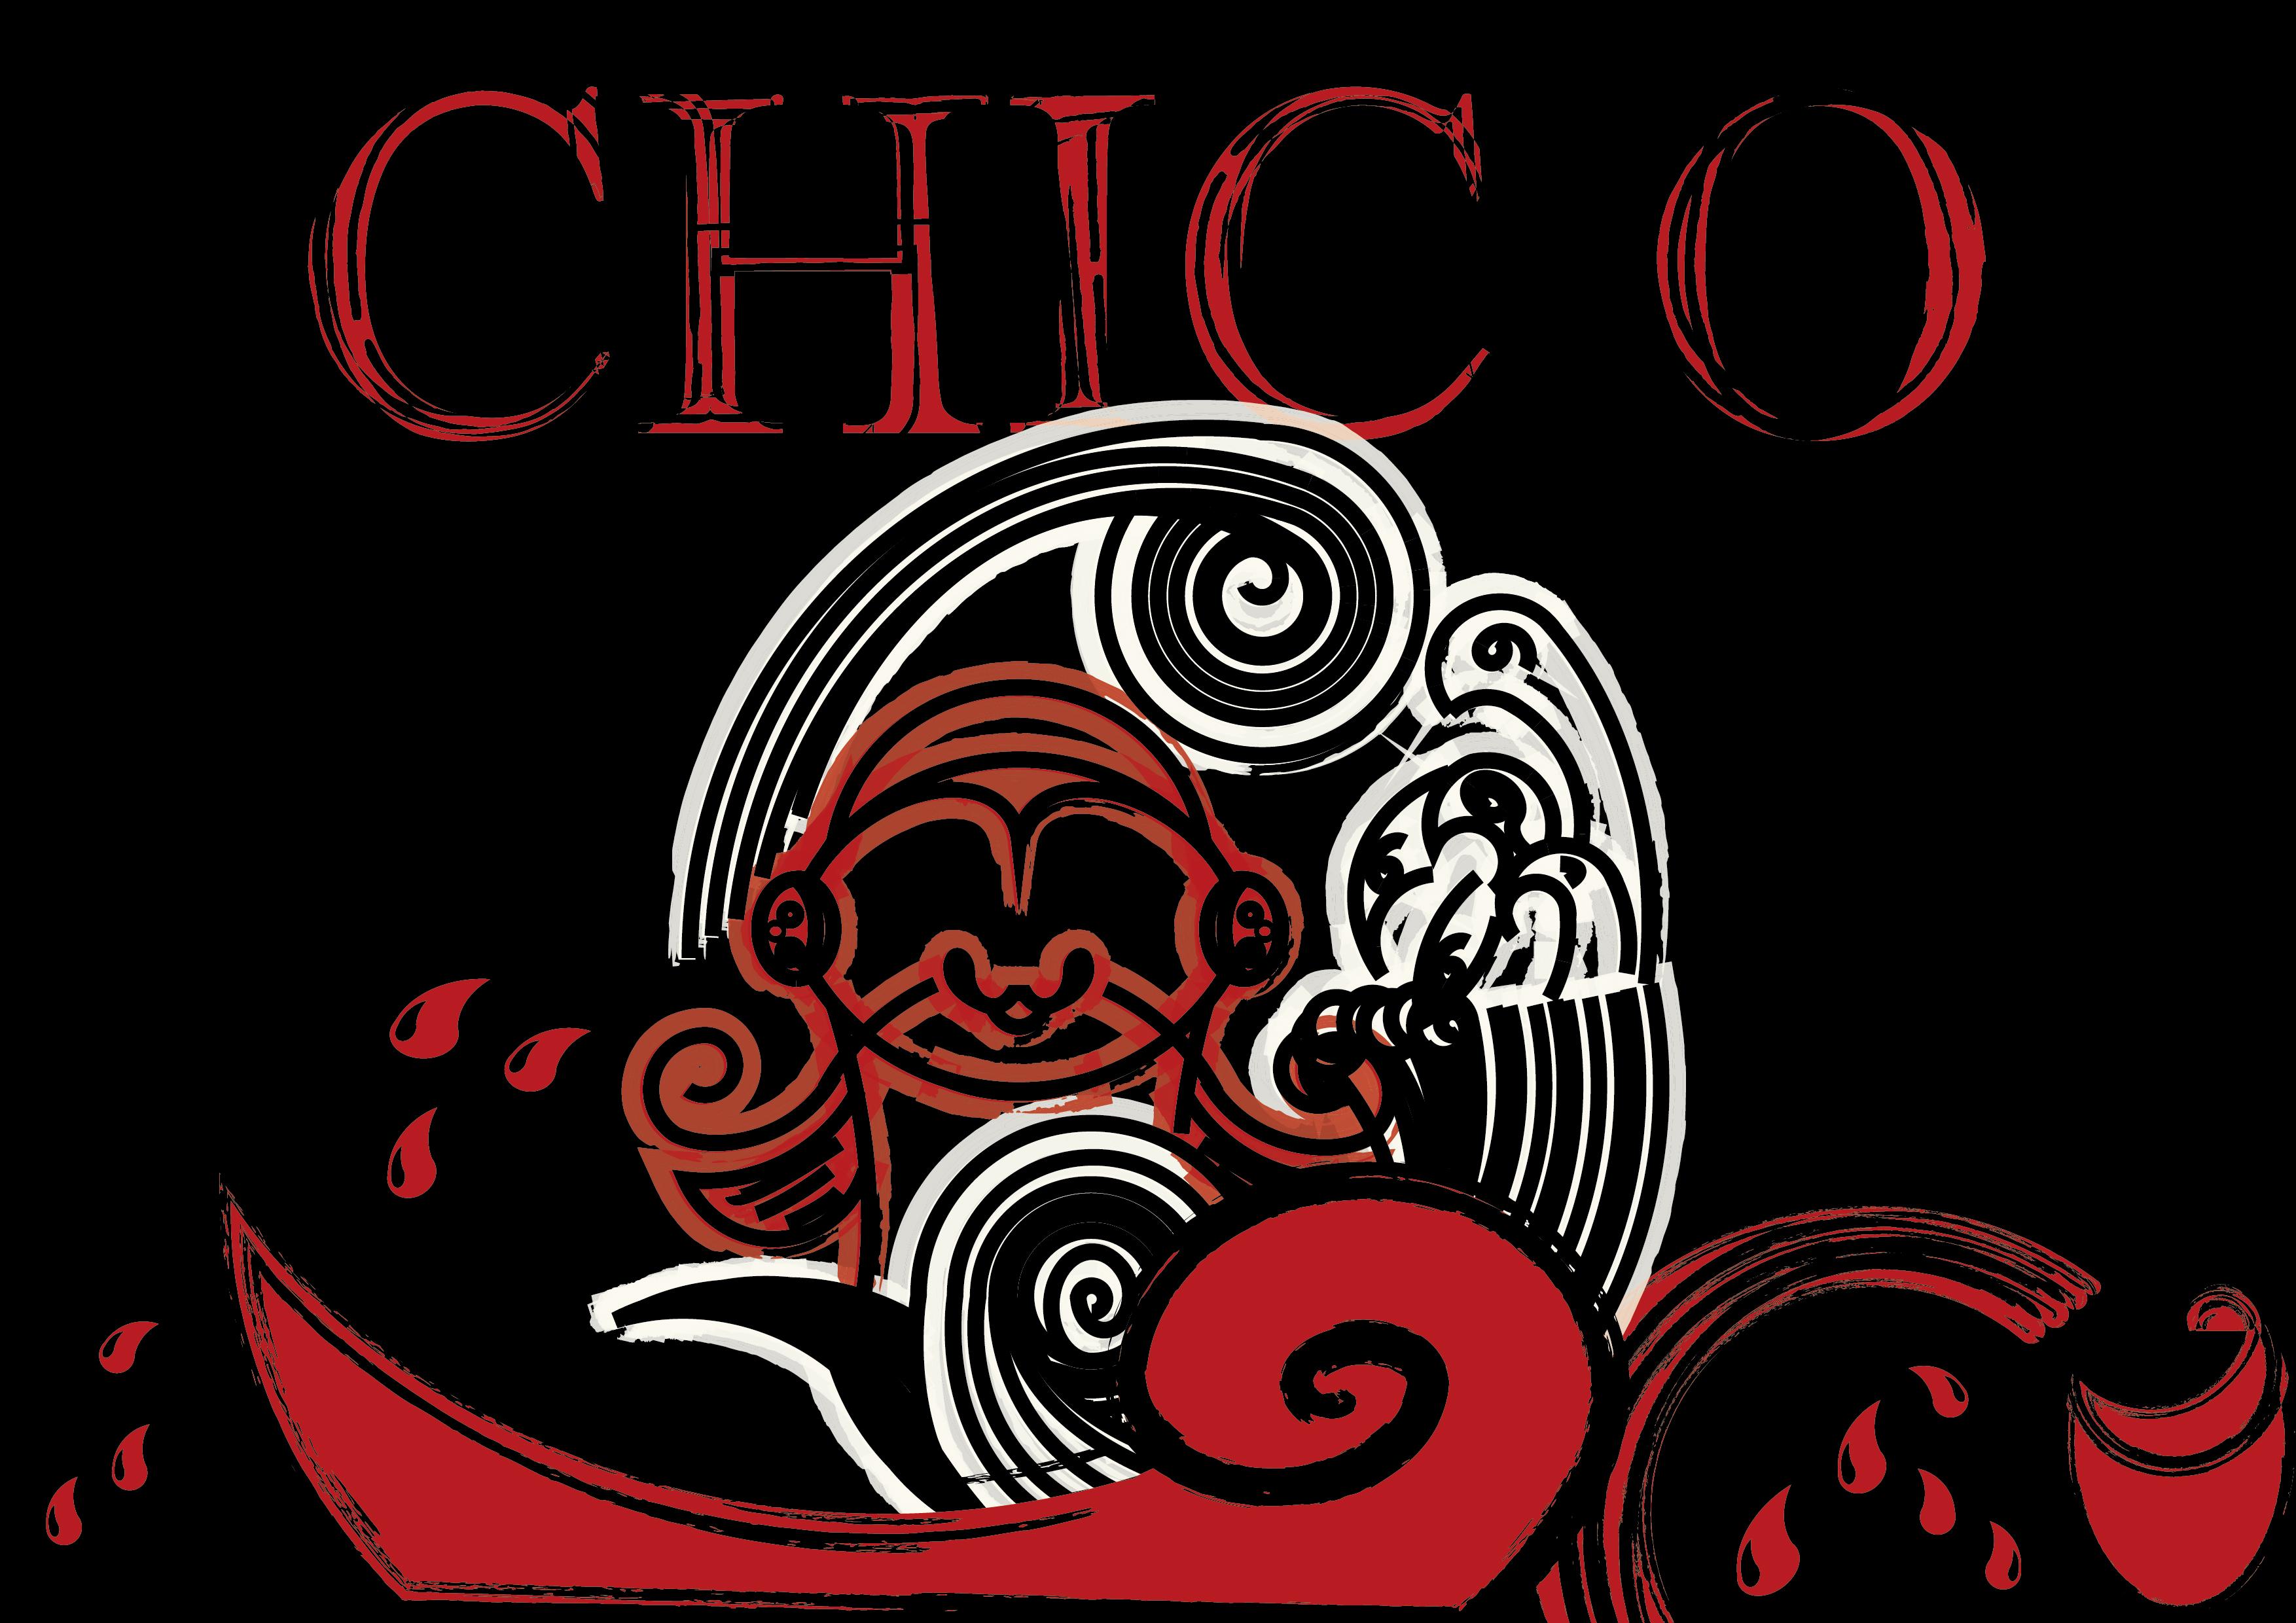 chic手绘字体